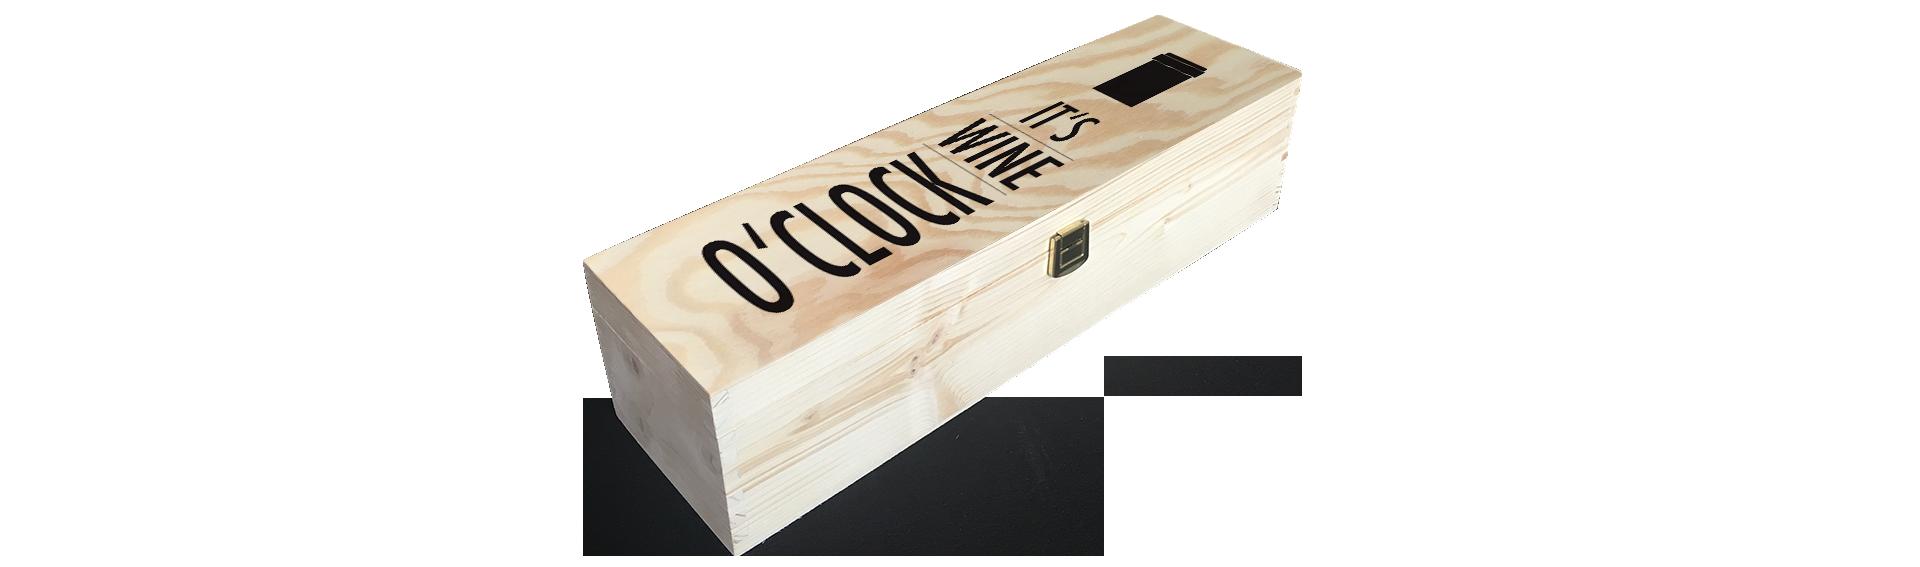 Wine o'clock | Holzkiste Weinkiste  bedruckt